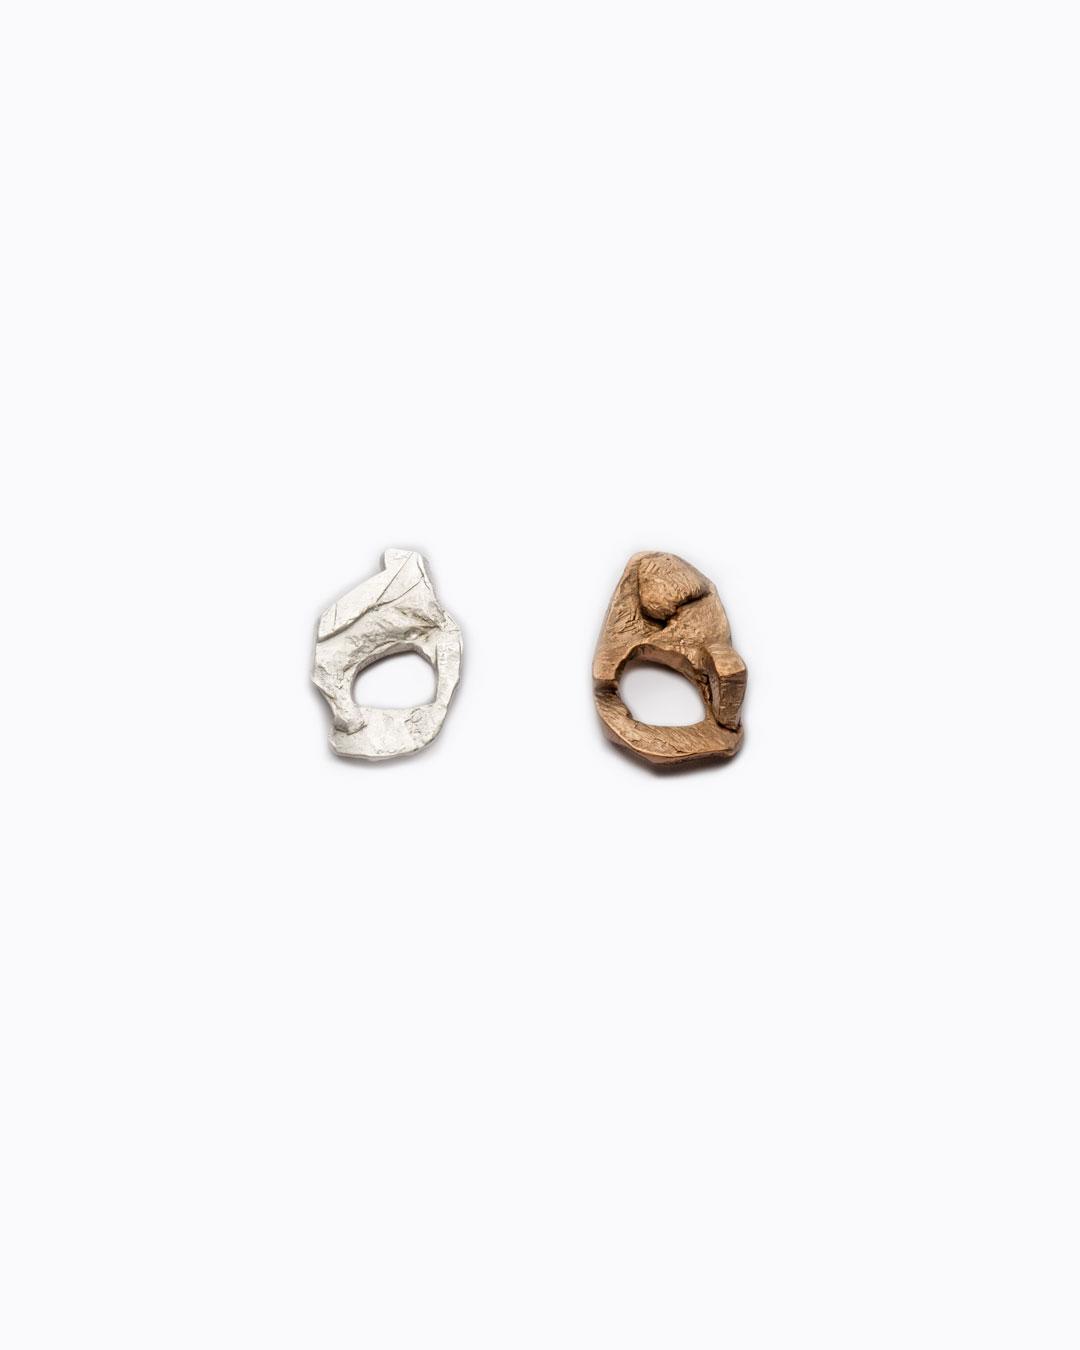 Iris Bodemer, untitled, 2012, ring; bronze, 30 x 55 x 10 mm (right), €750